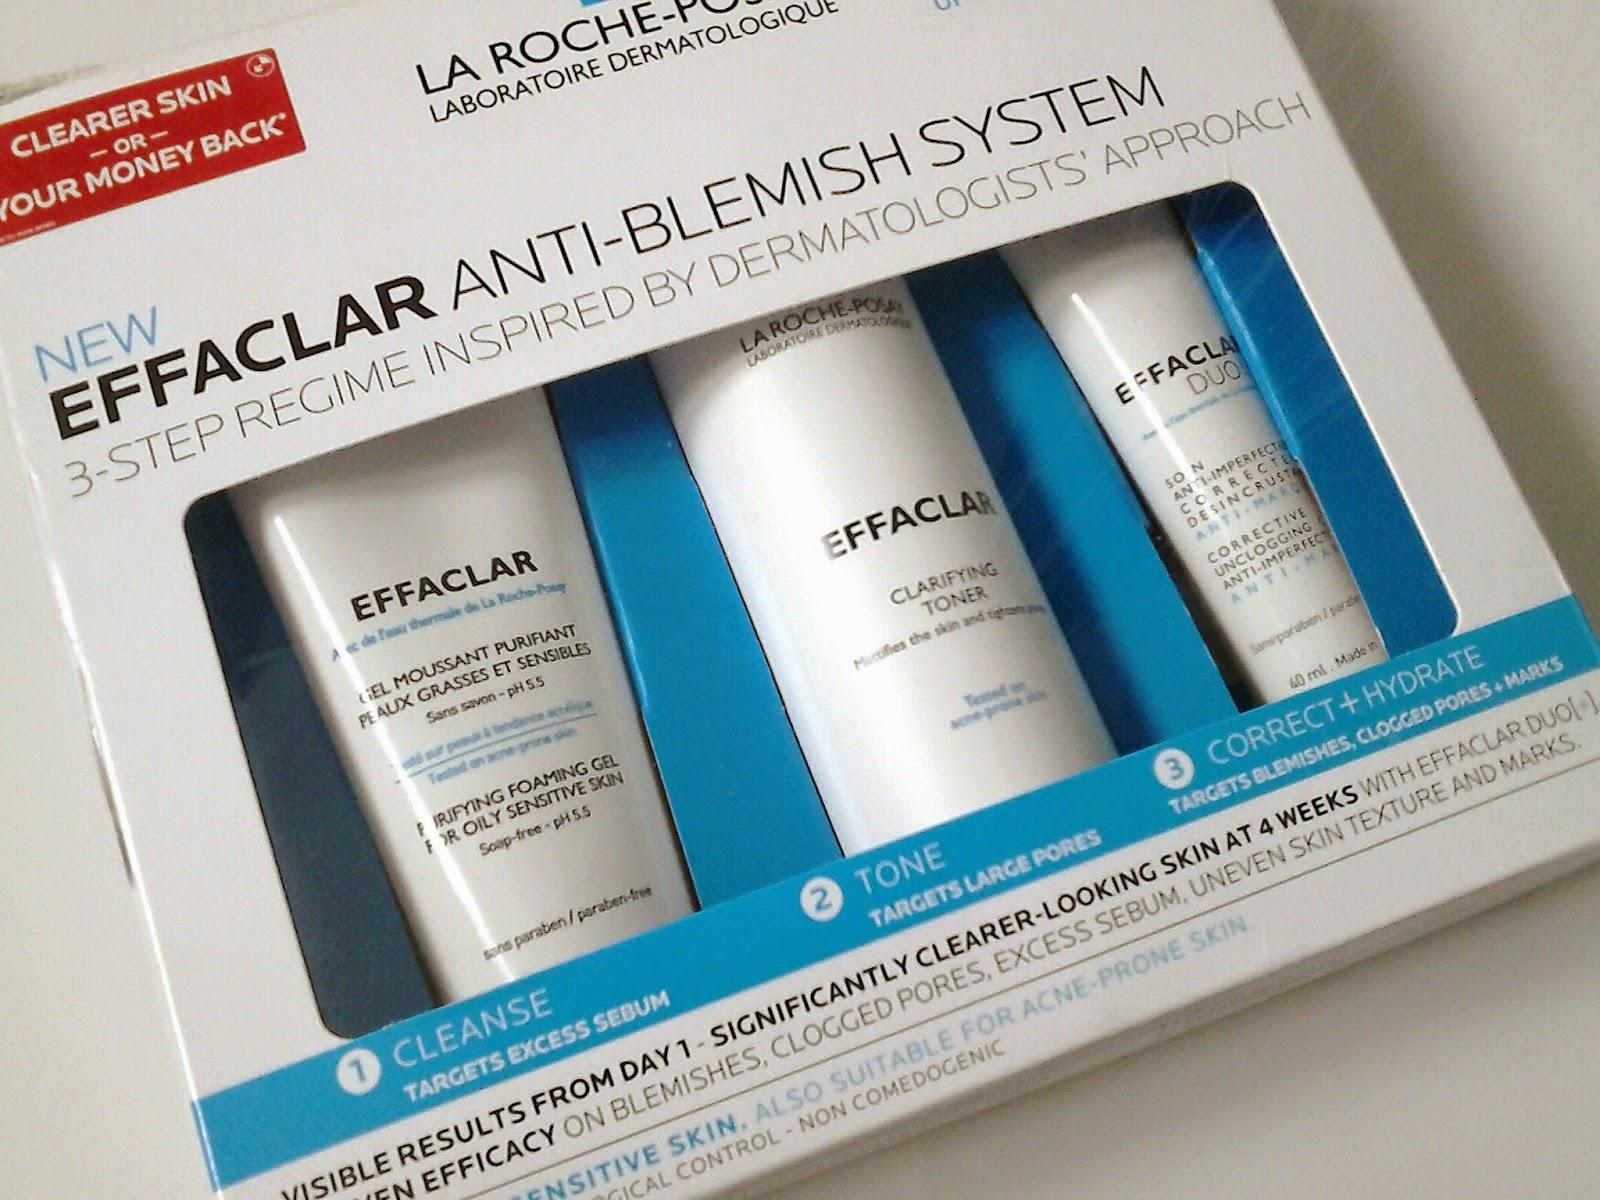 La Roche-Posay Effaclar 3-Step Anti-Blemish System